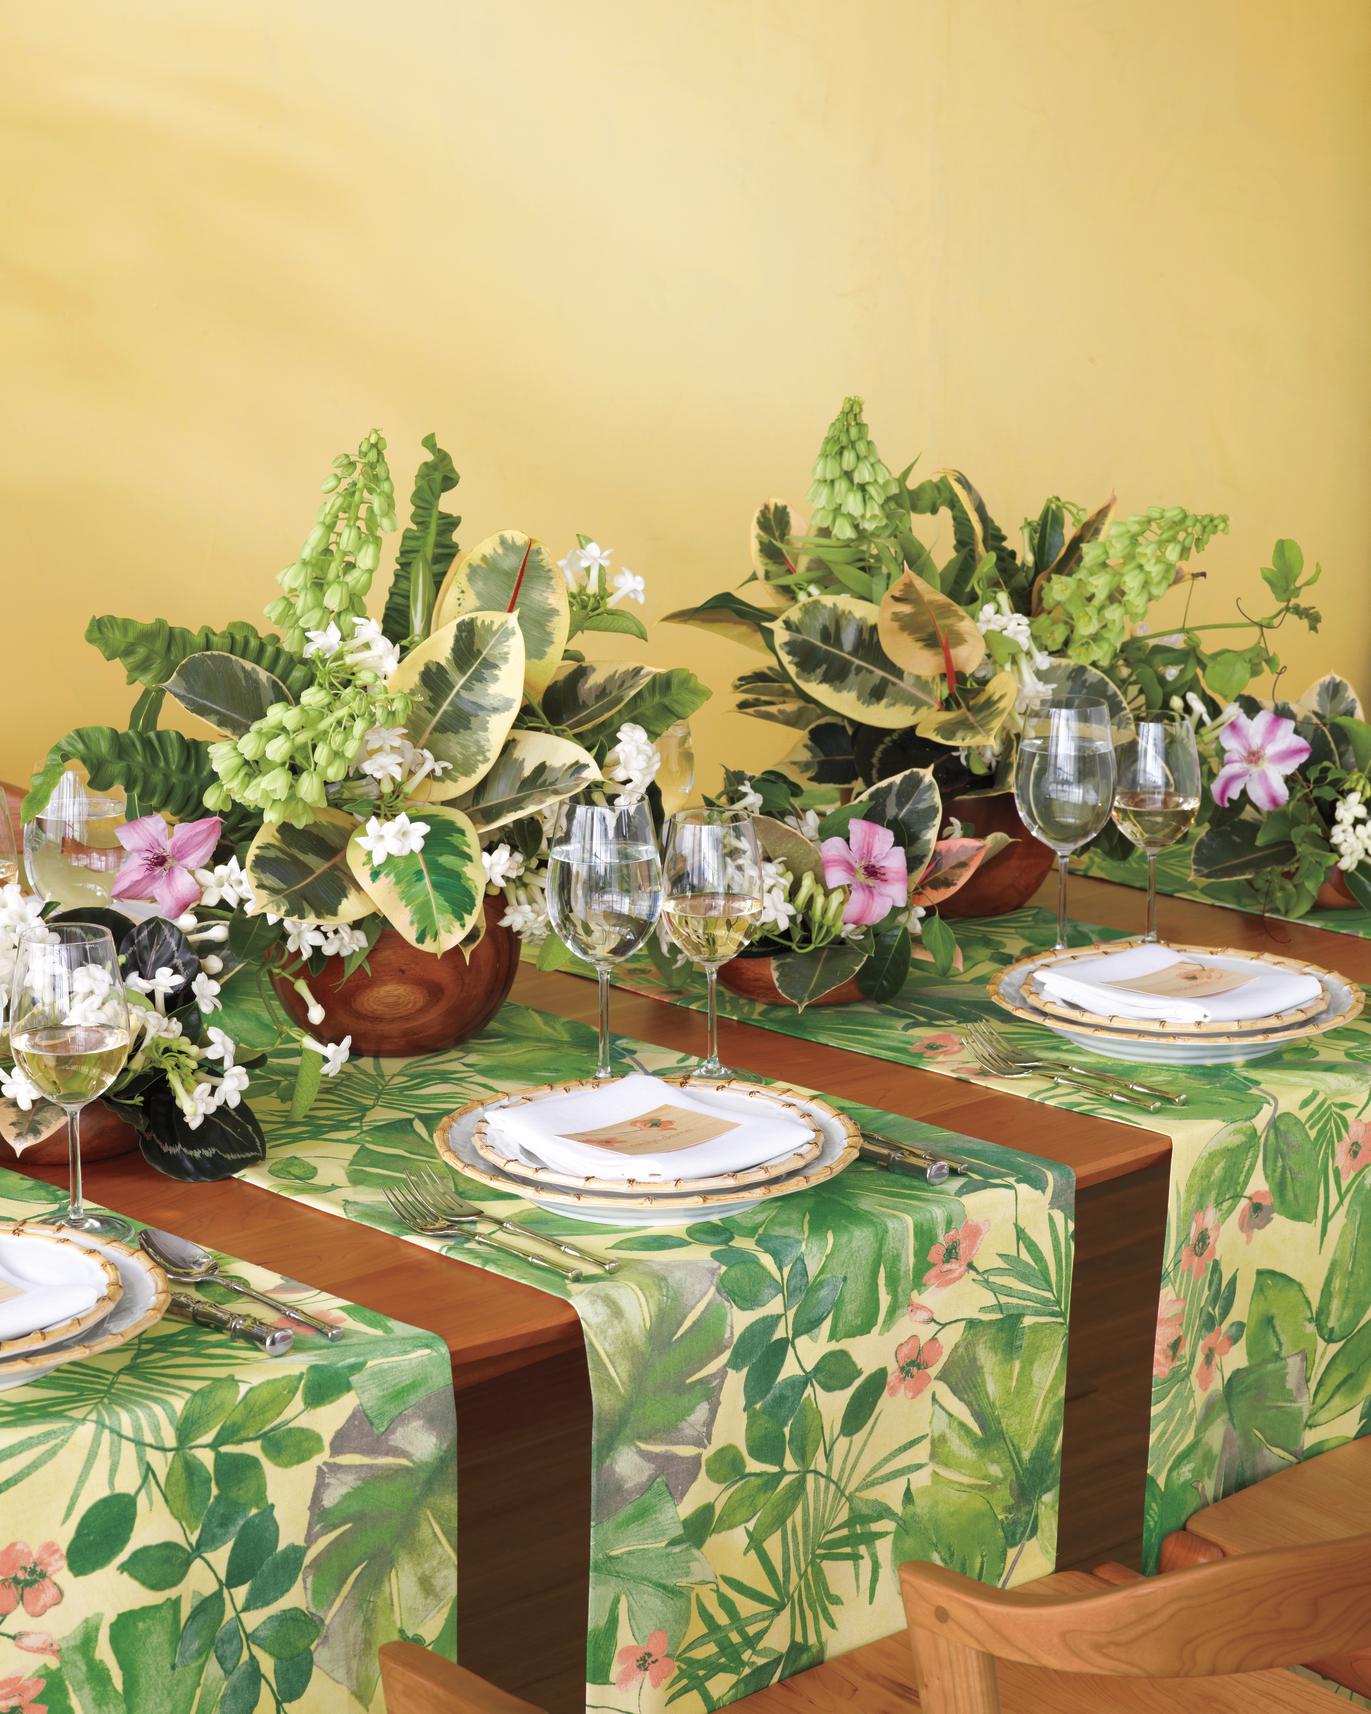 fabric-flowers-tropicalc2-md108763.jpg